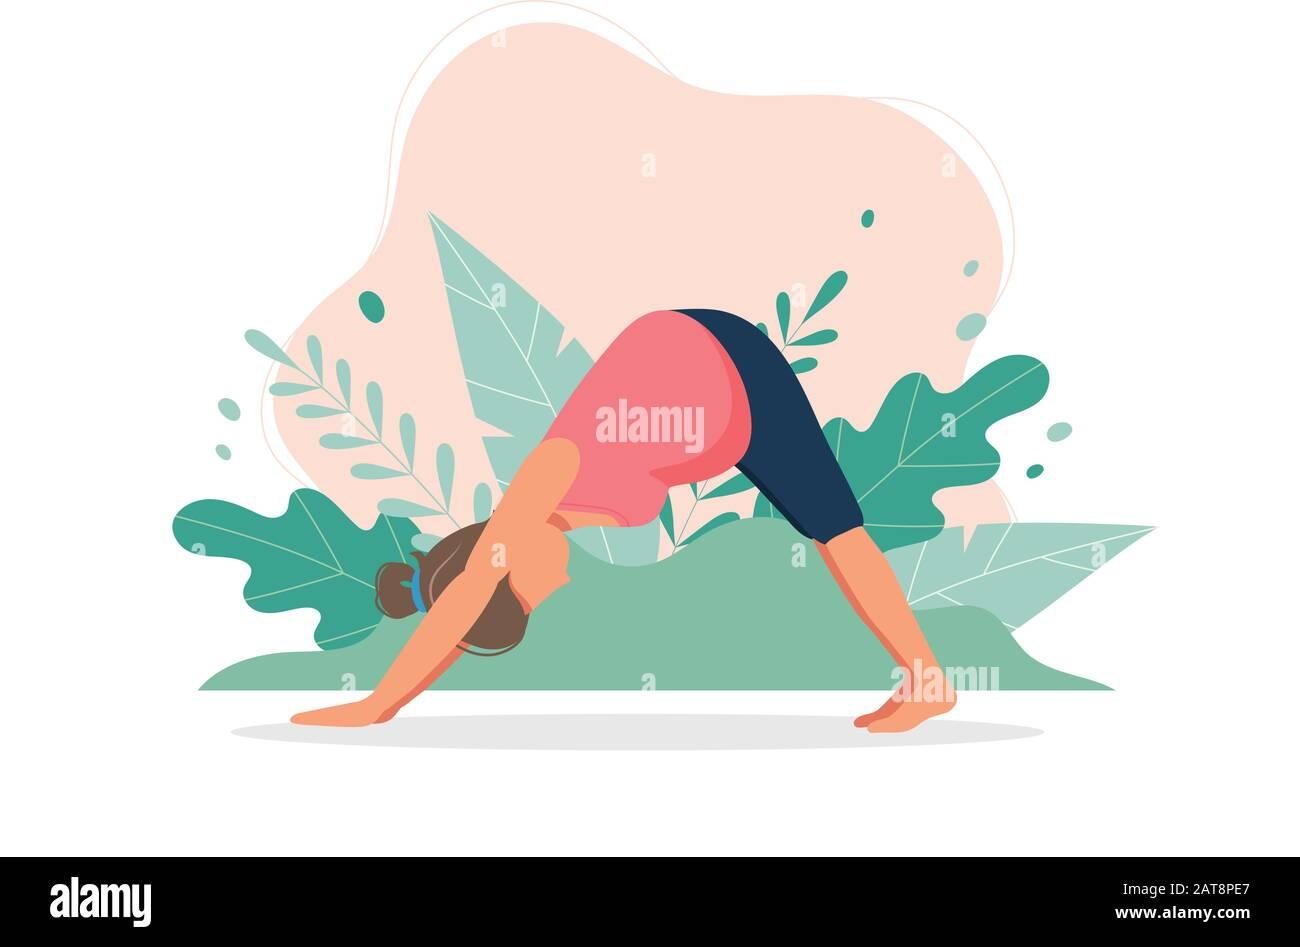 Pregnant Woman Doing Prenatal Yoga Pregnancy Health Concept Cute Vector Illustration In Flat Style Stock Vector Image Art Alamy